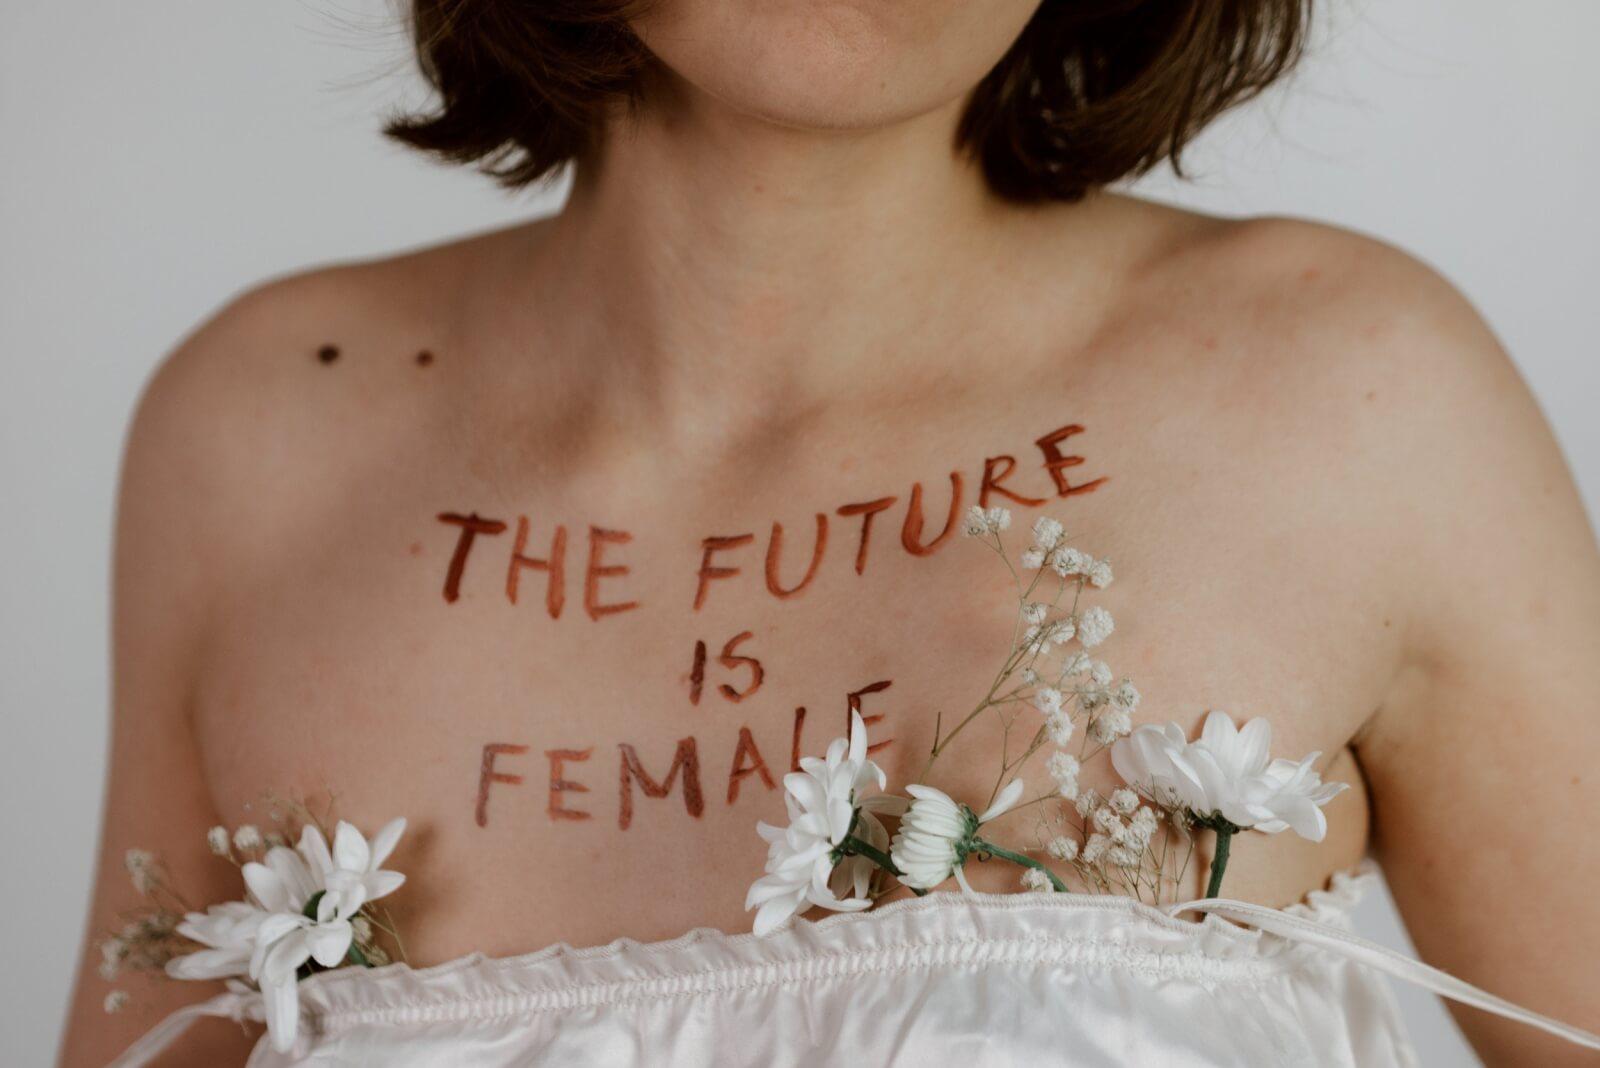 female empowerment instagram hashtags